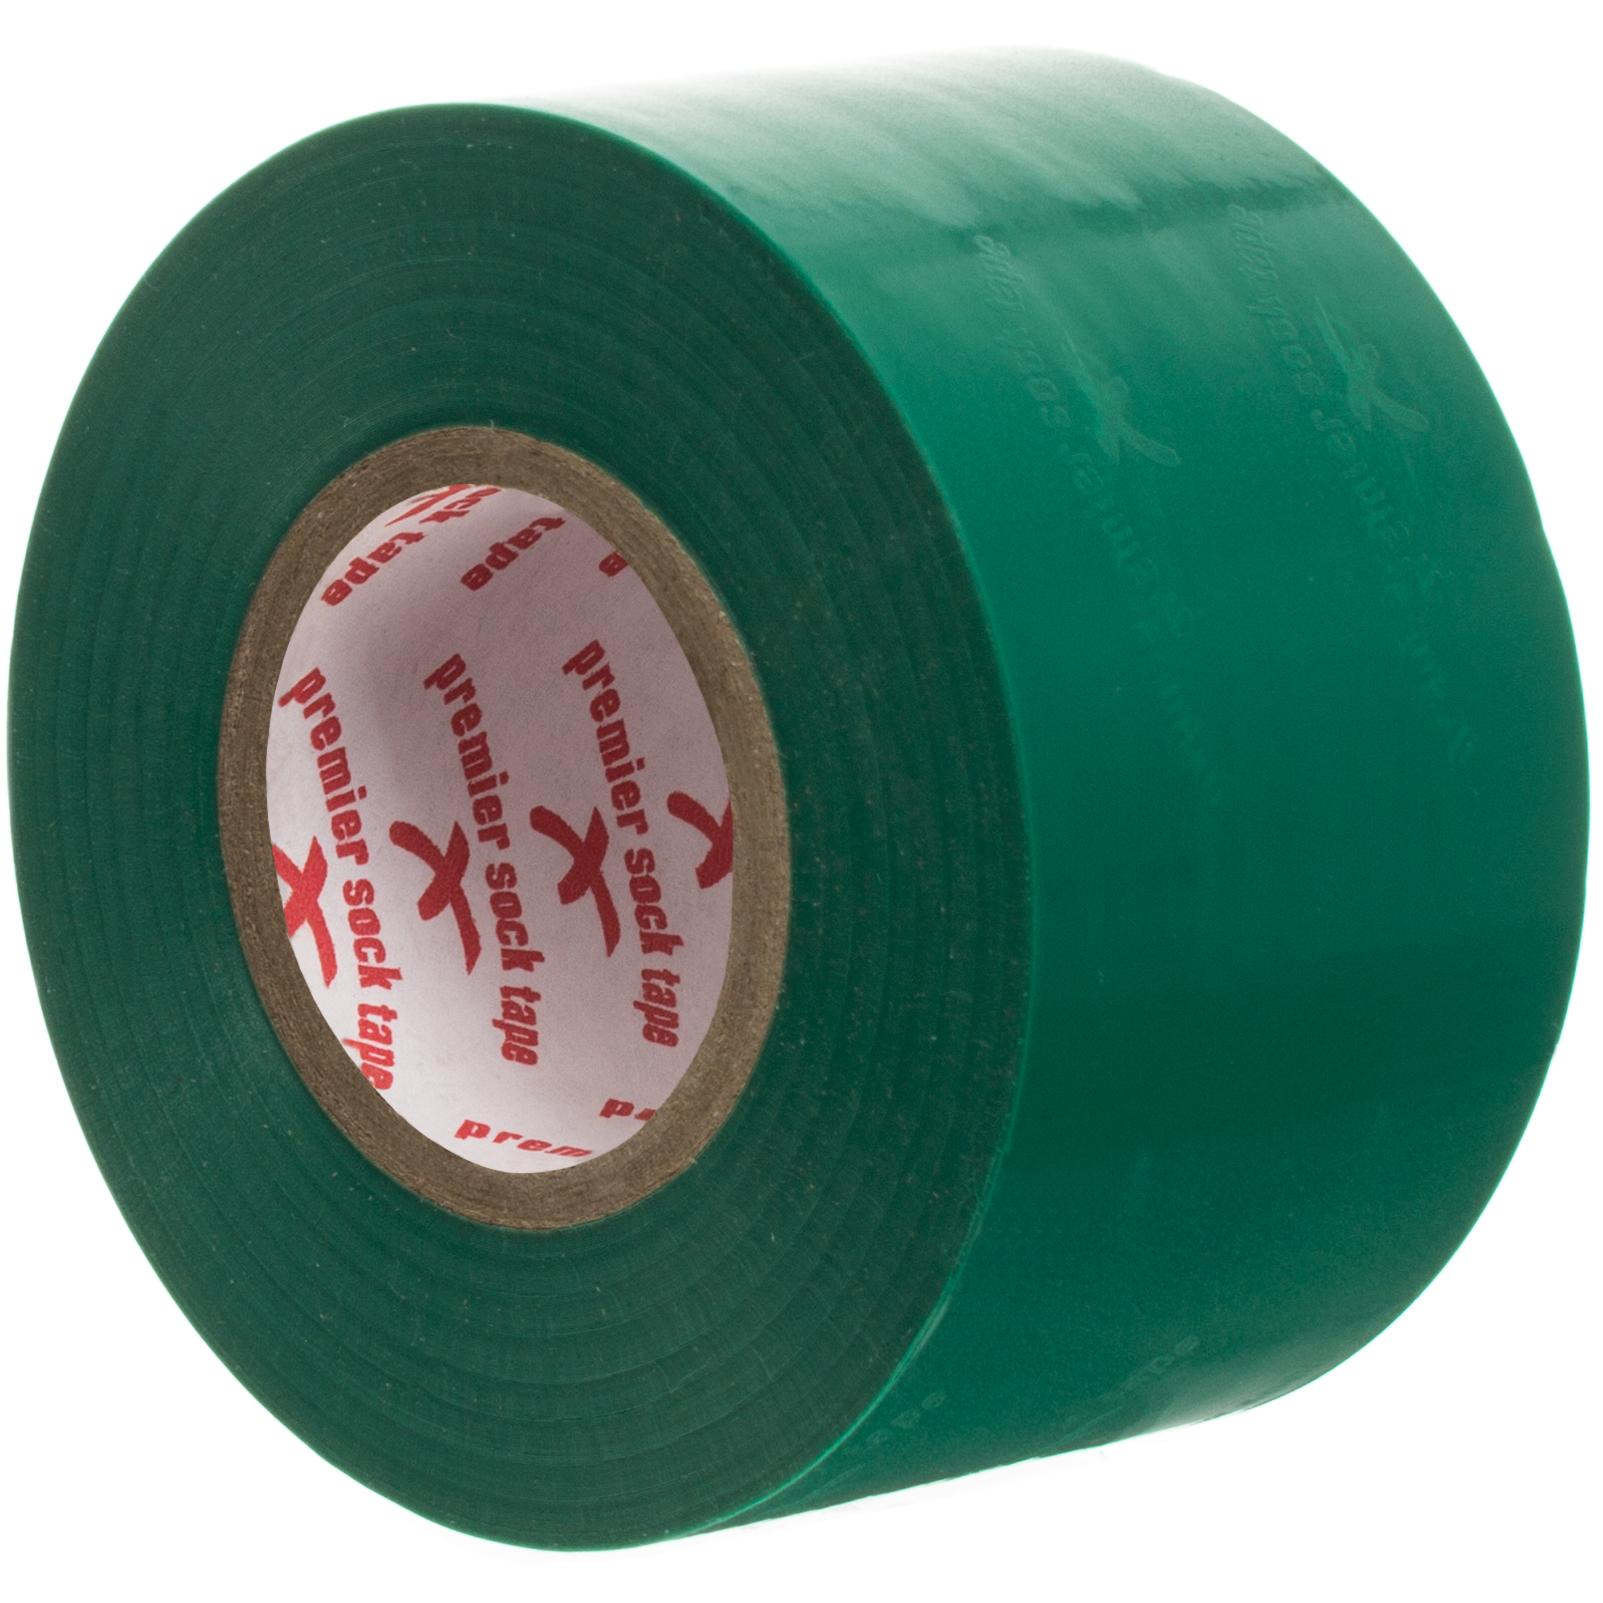 Premier Sock Tape Strumptejp Bred 20m Grön